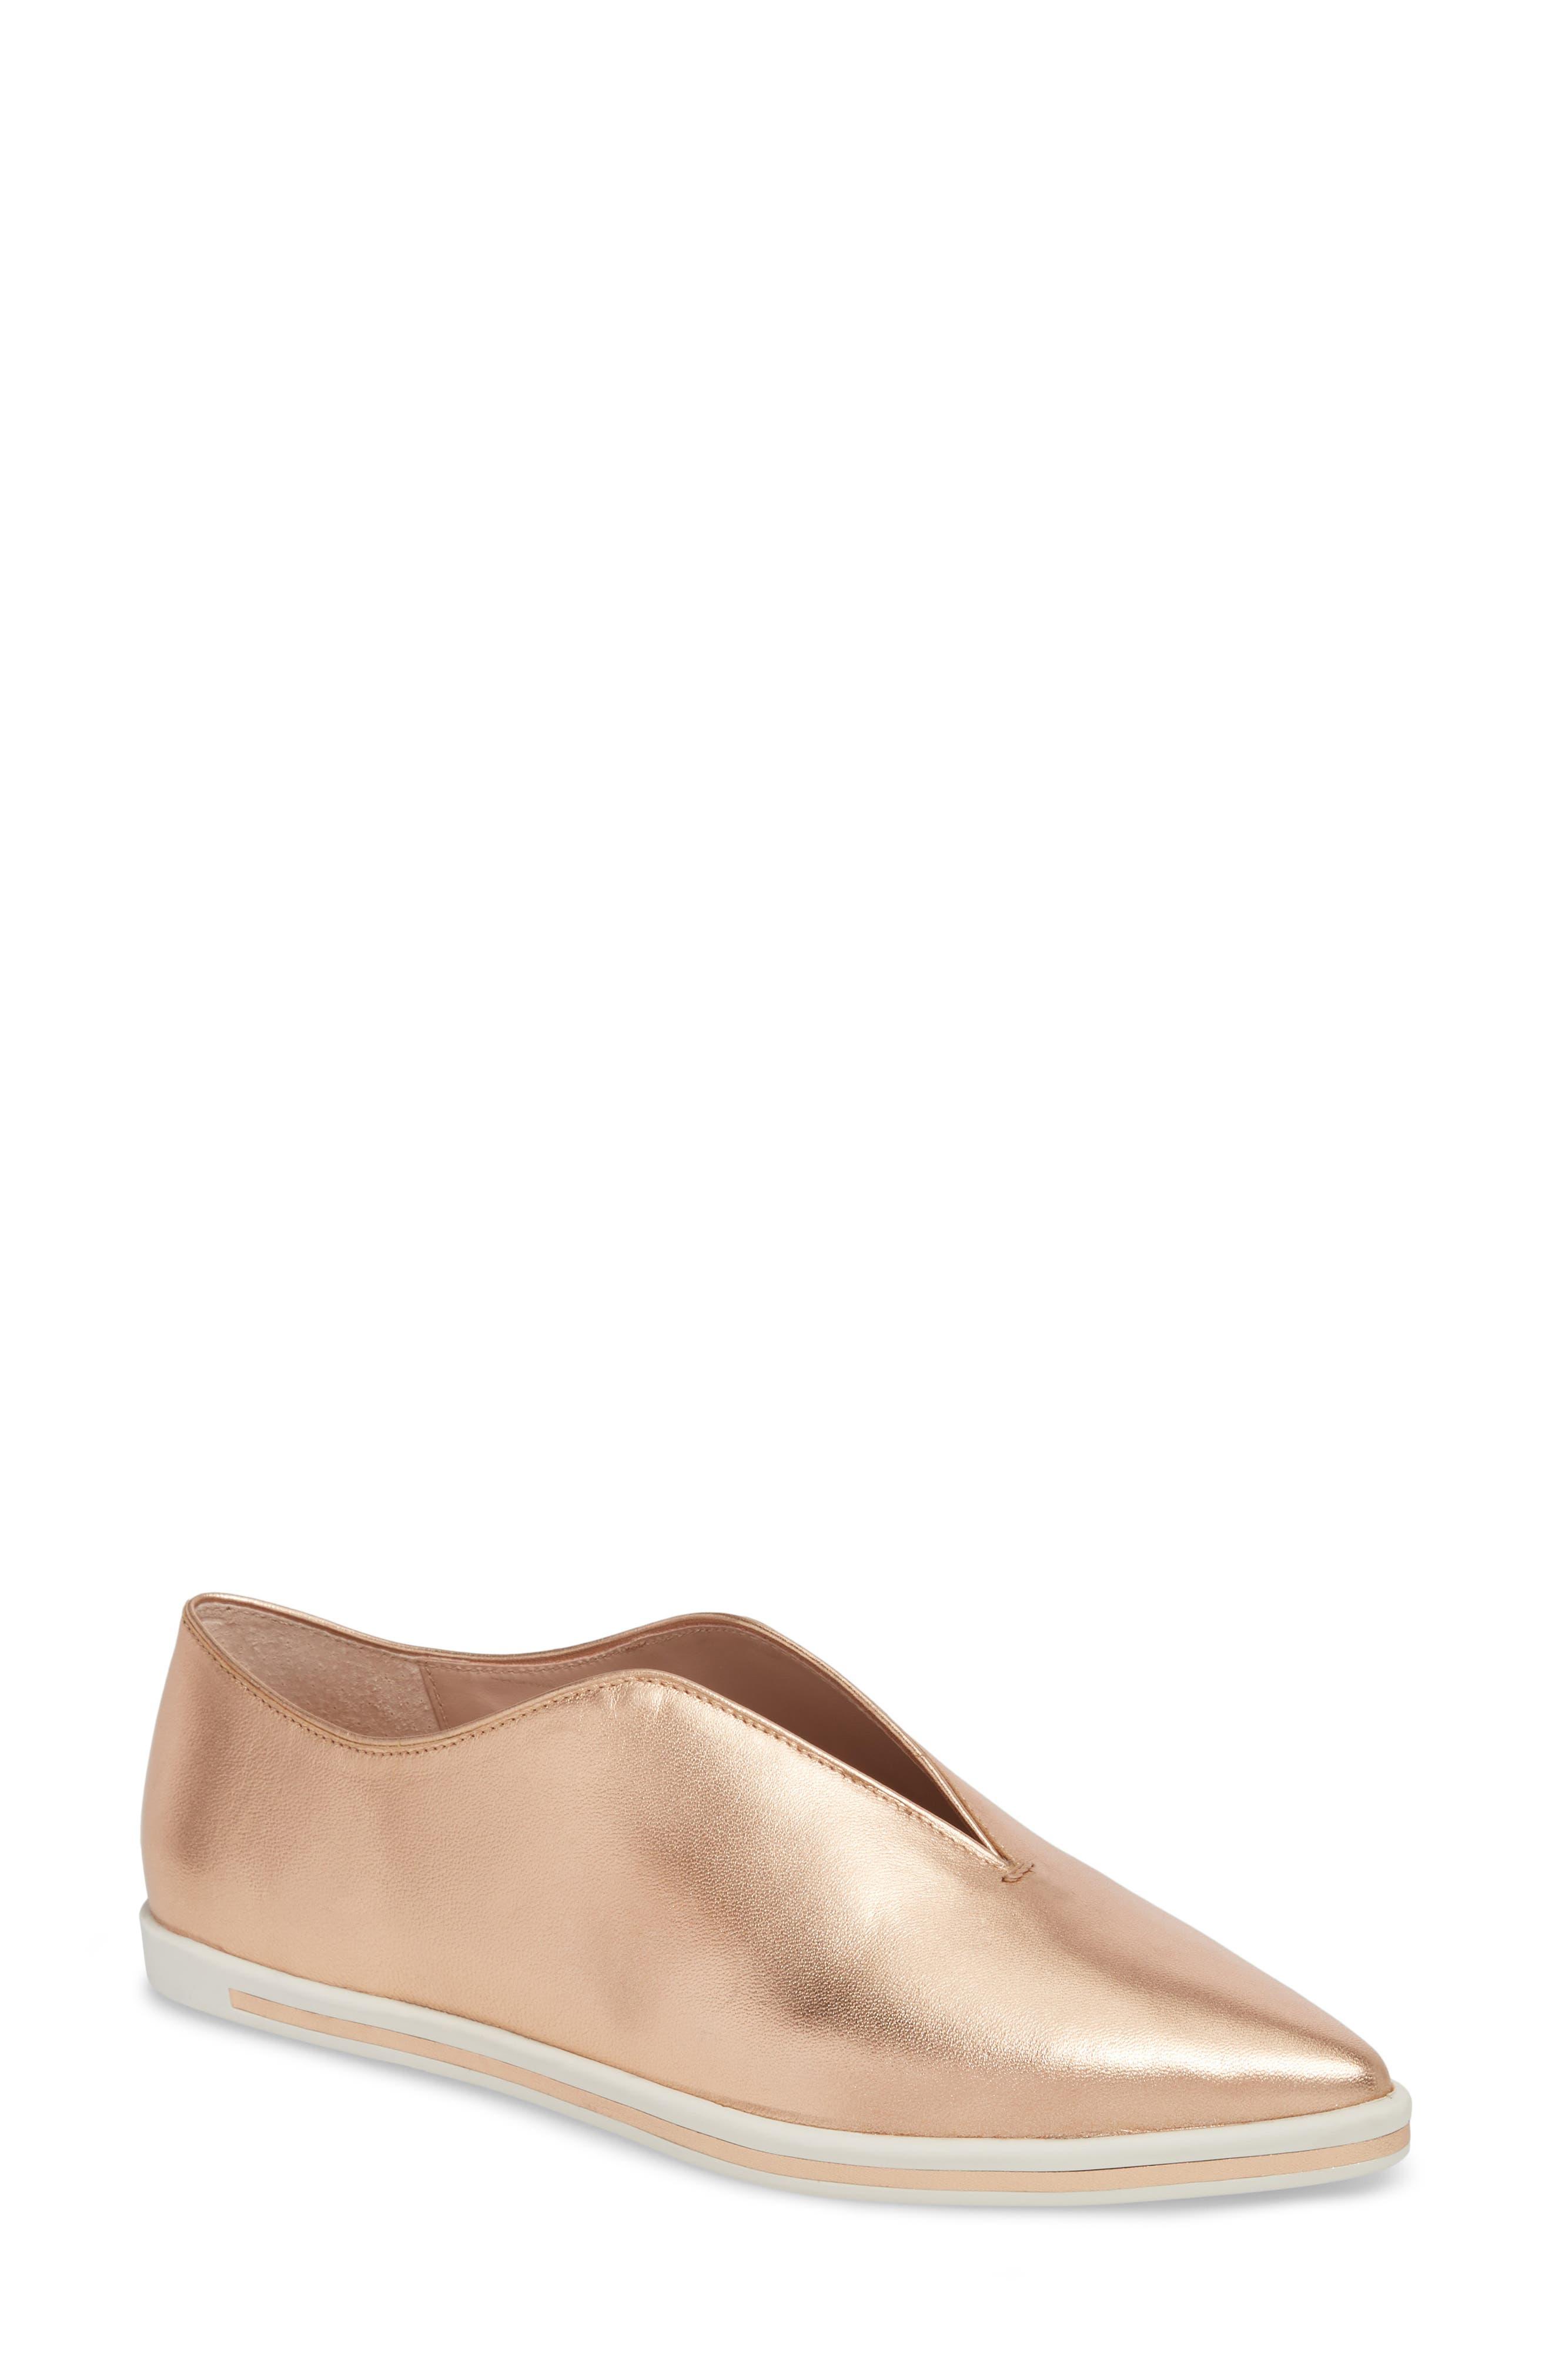 Tisha Slip-On Sneaker,                         Main,                         color, Rose Gold Leather